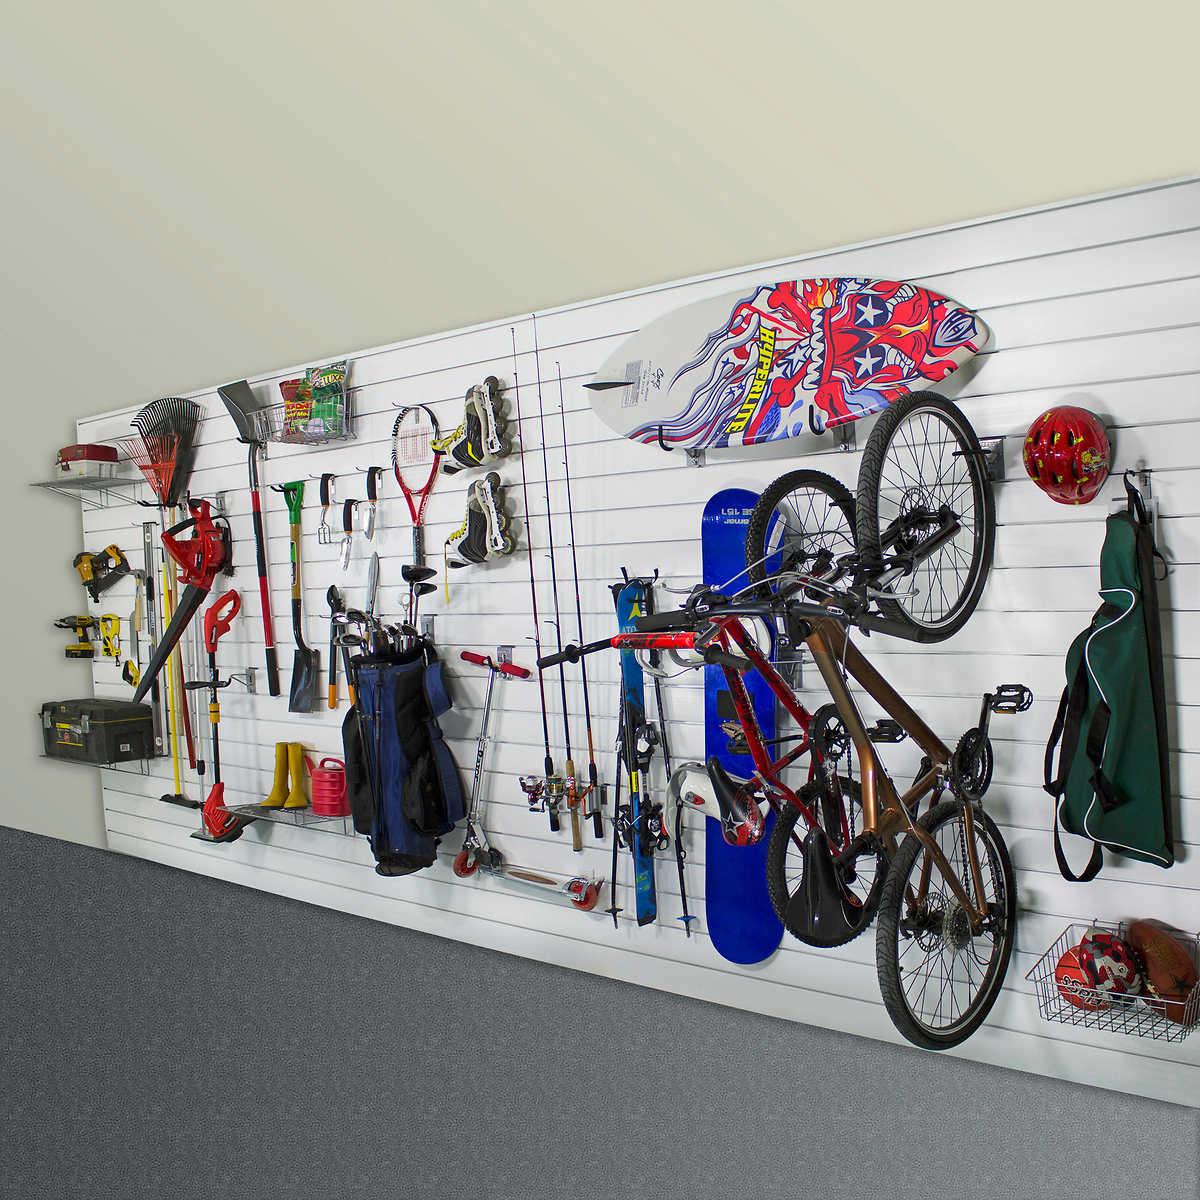 Proslat Wall Storage Garage Wall Bundle 192 sq. ft. with 38pc Hooks &  Accessories - Garage Storage Racks Costco